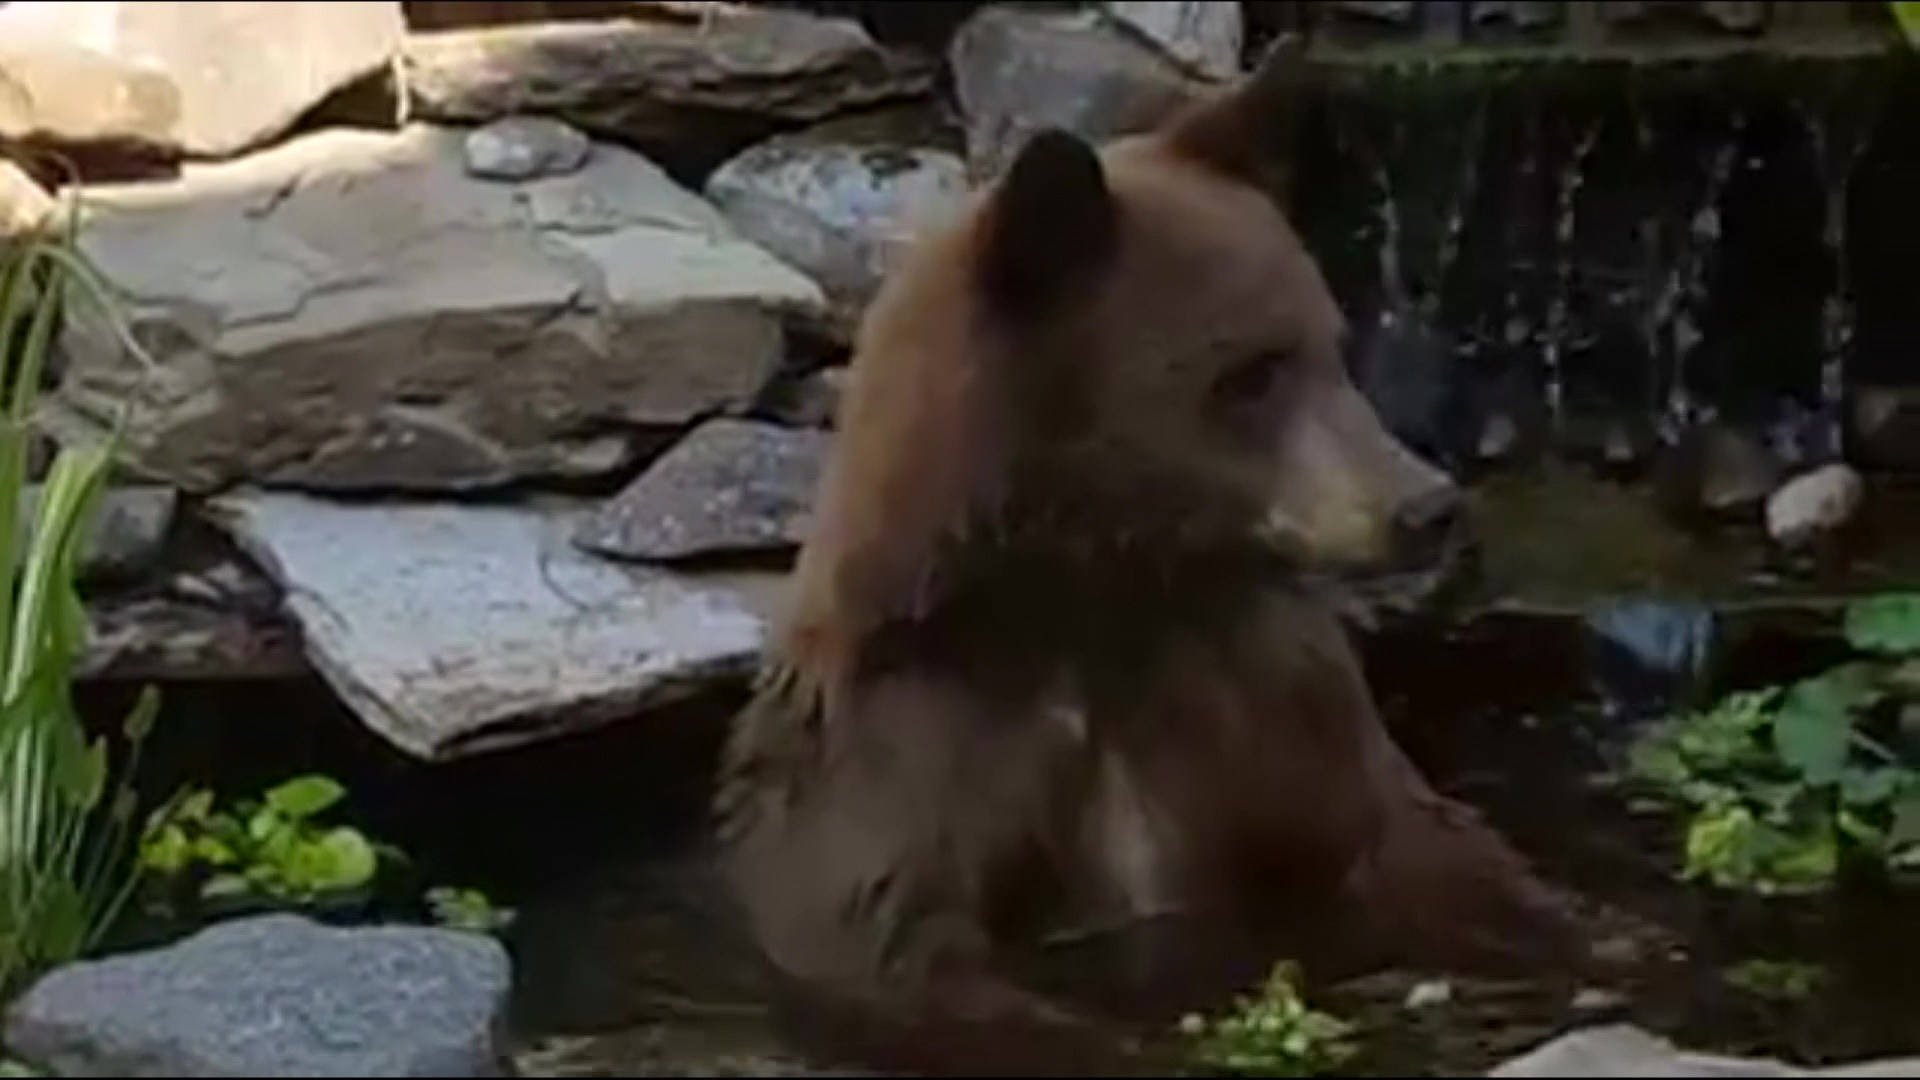 Montana sanders county dixon - Bear Takes A Dip In Montana Koi Pond